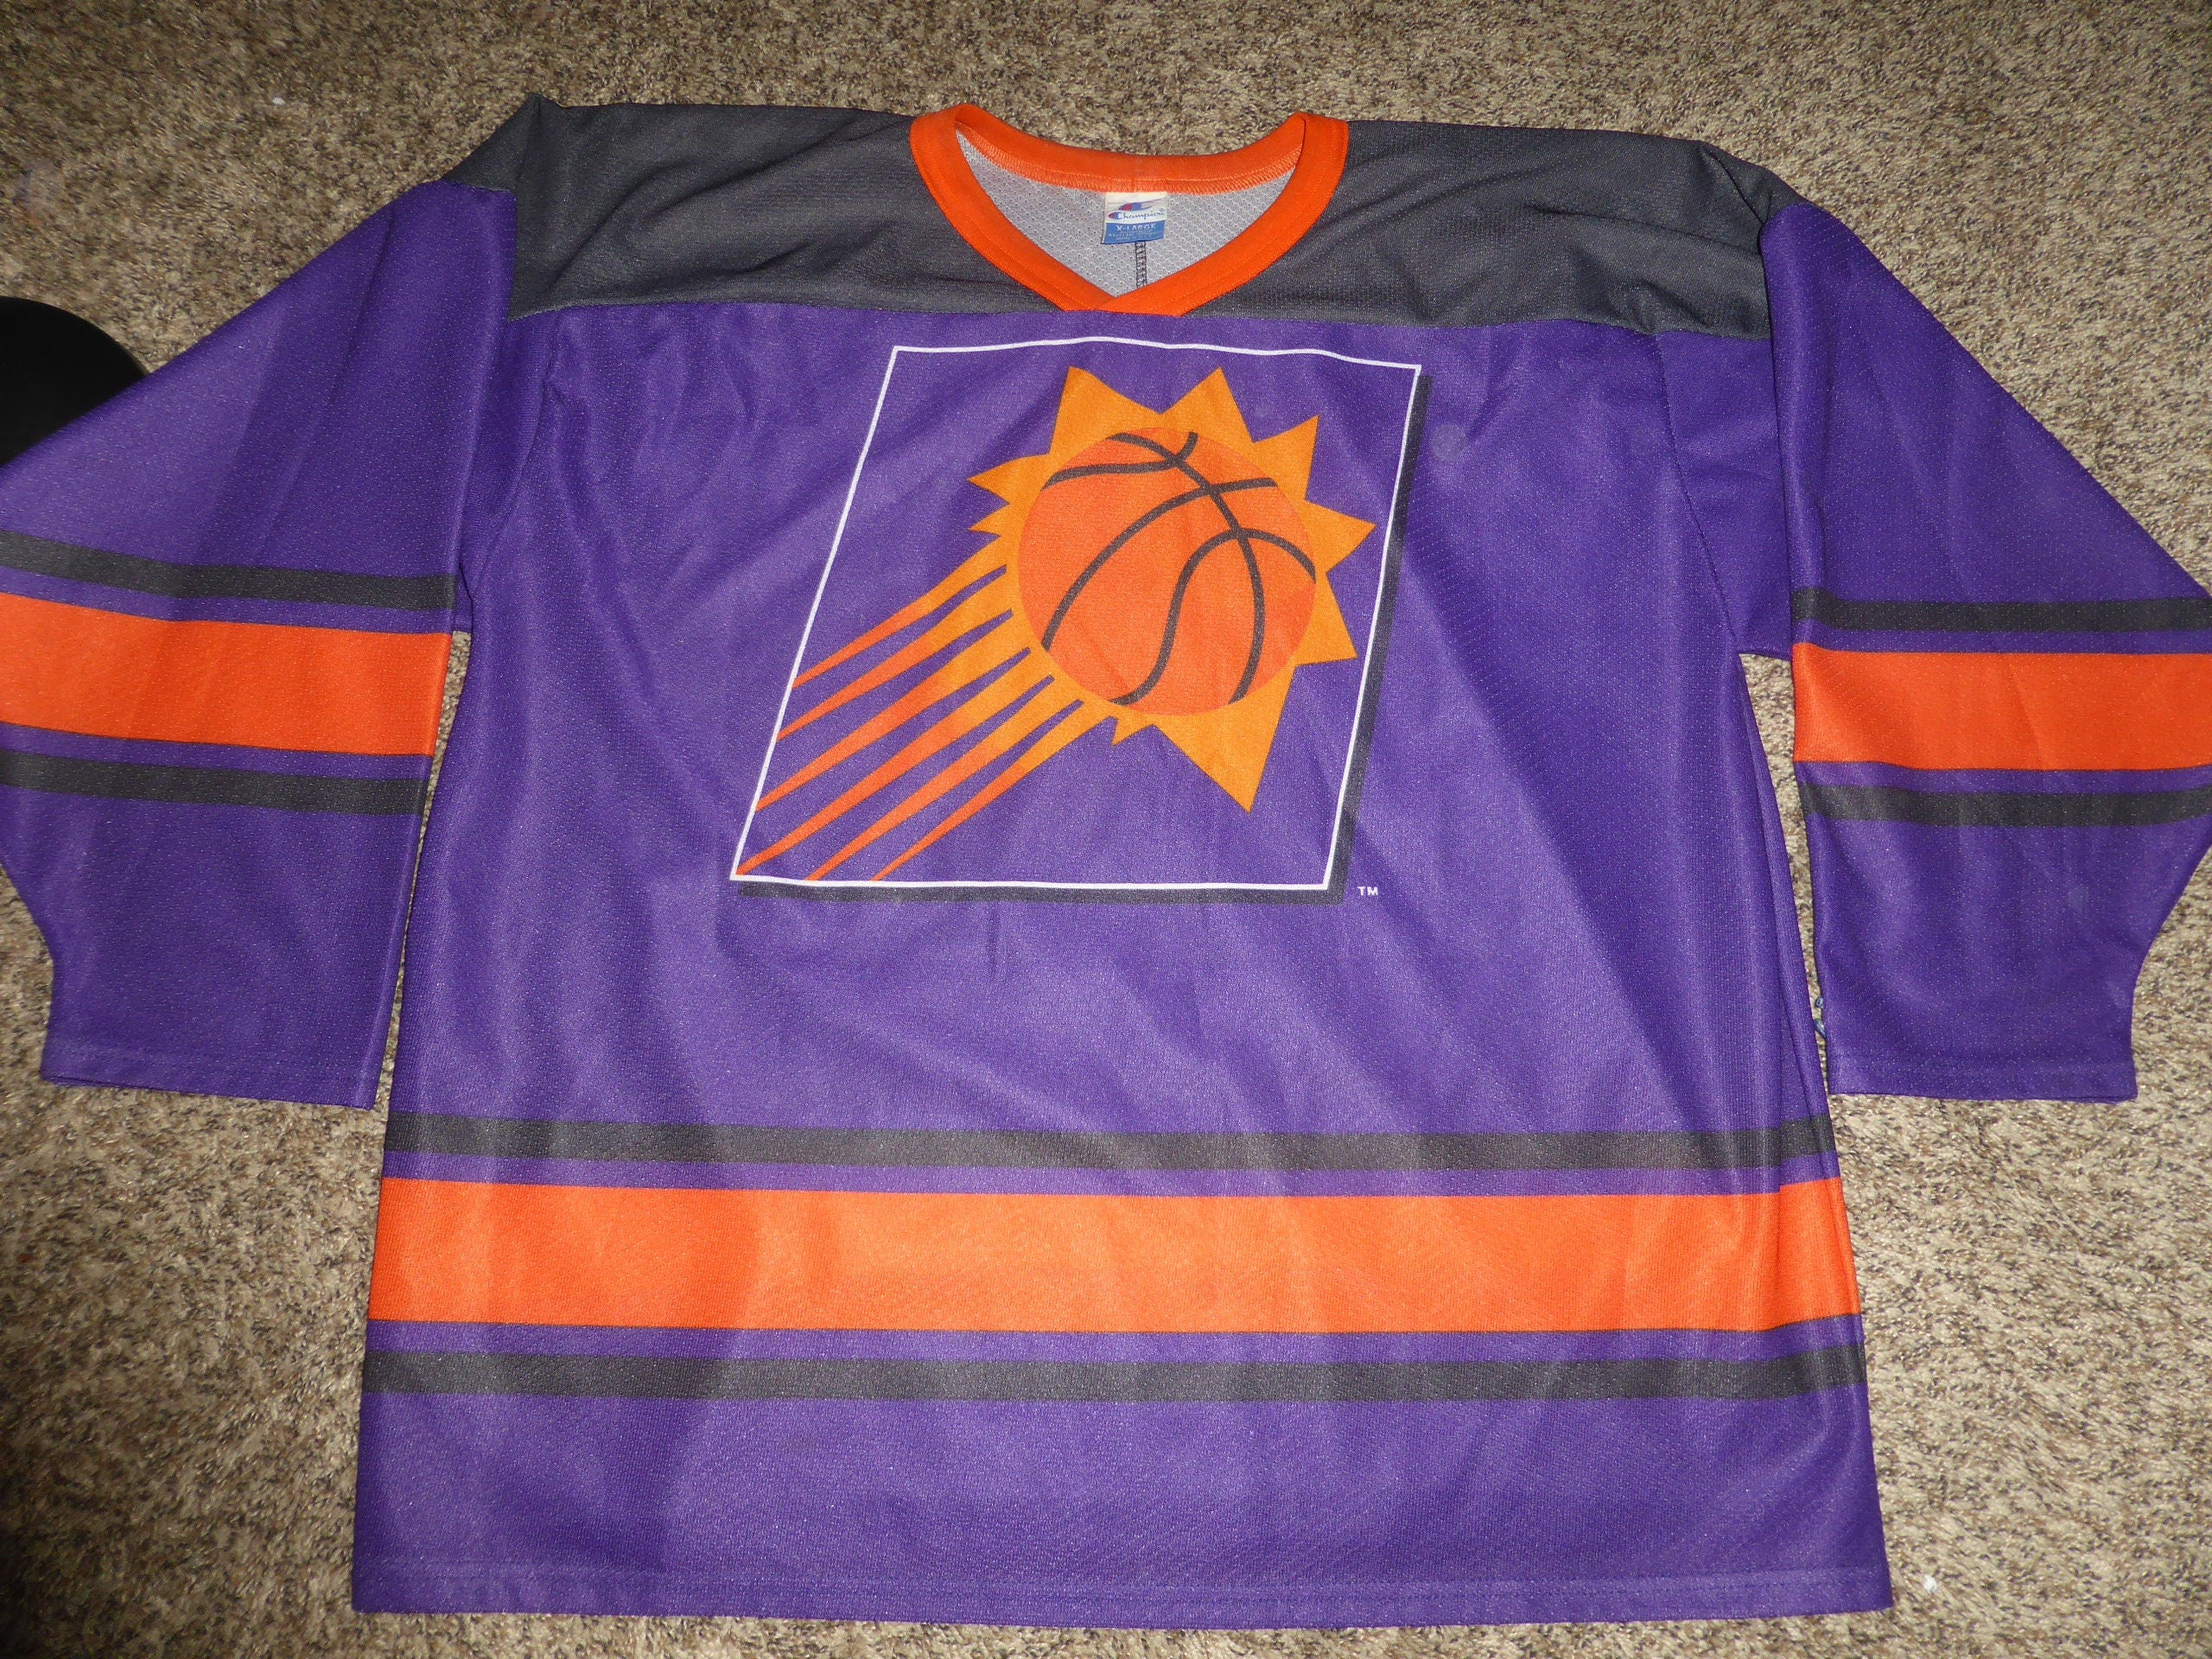 9ecbddd1c57 Vtg Phoenix Suns NBA Champion Hockey Jersey Sz Men s XL